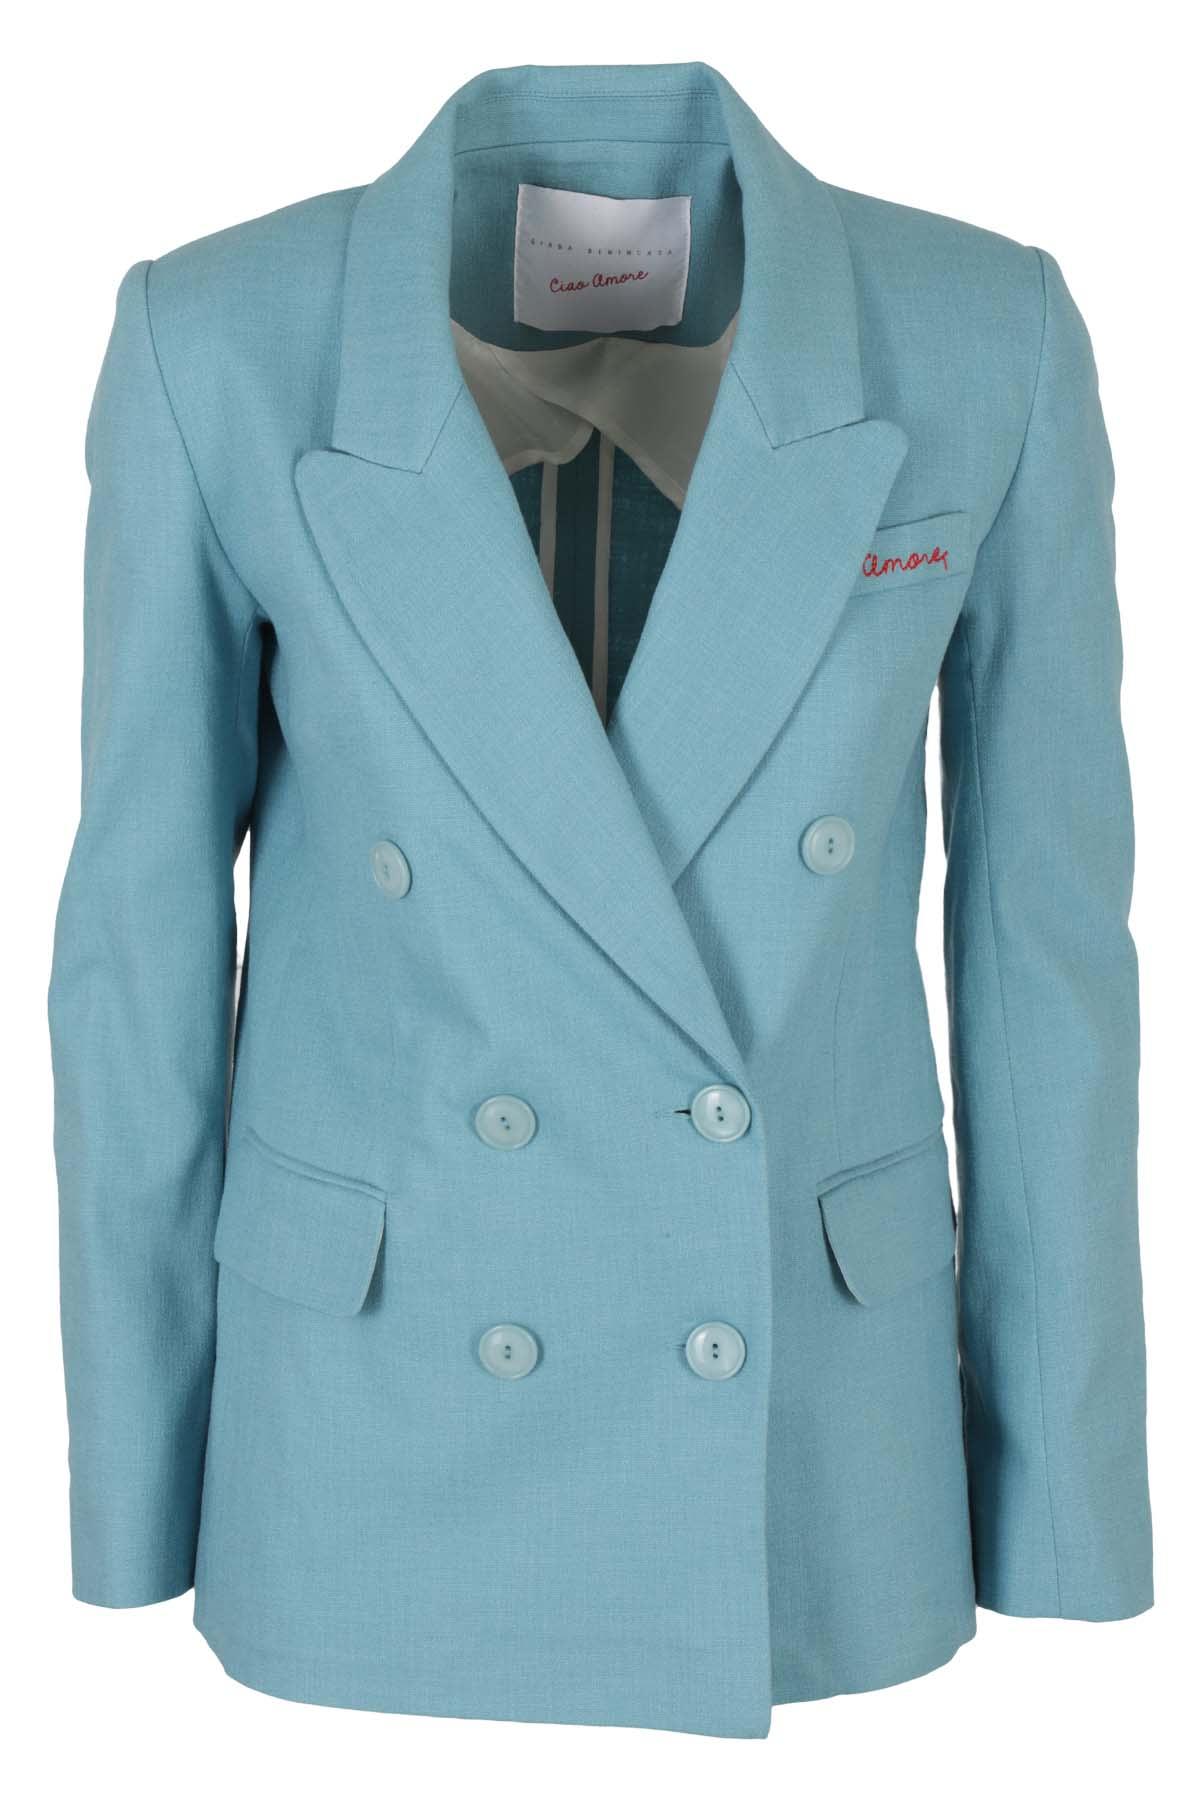 Photo of  Giada Benincasa Jacket- shop Giada Benincasa jackets online sales